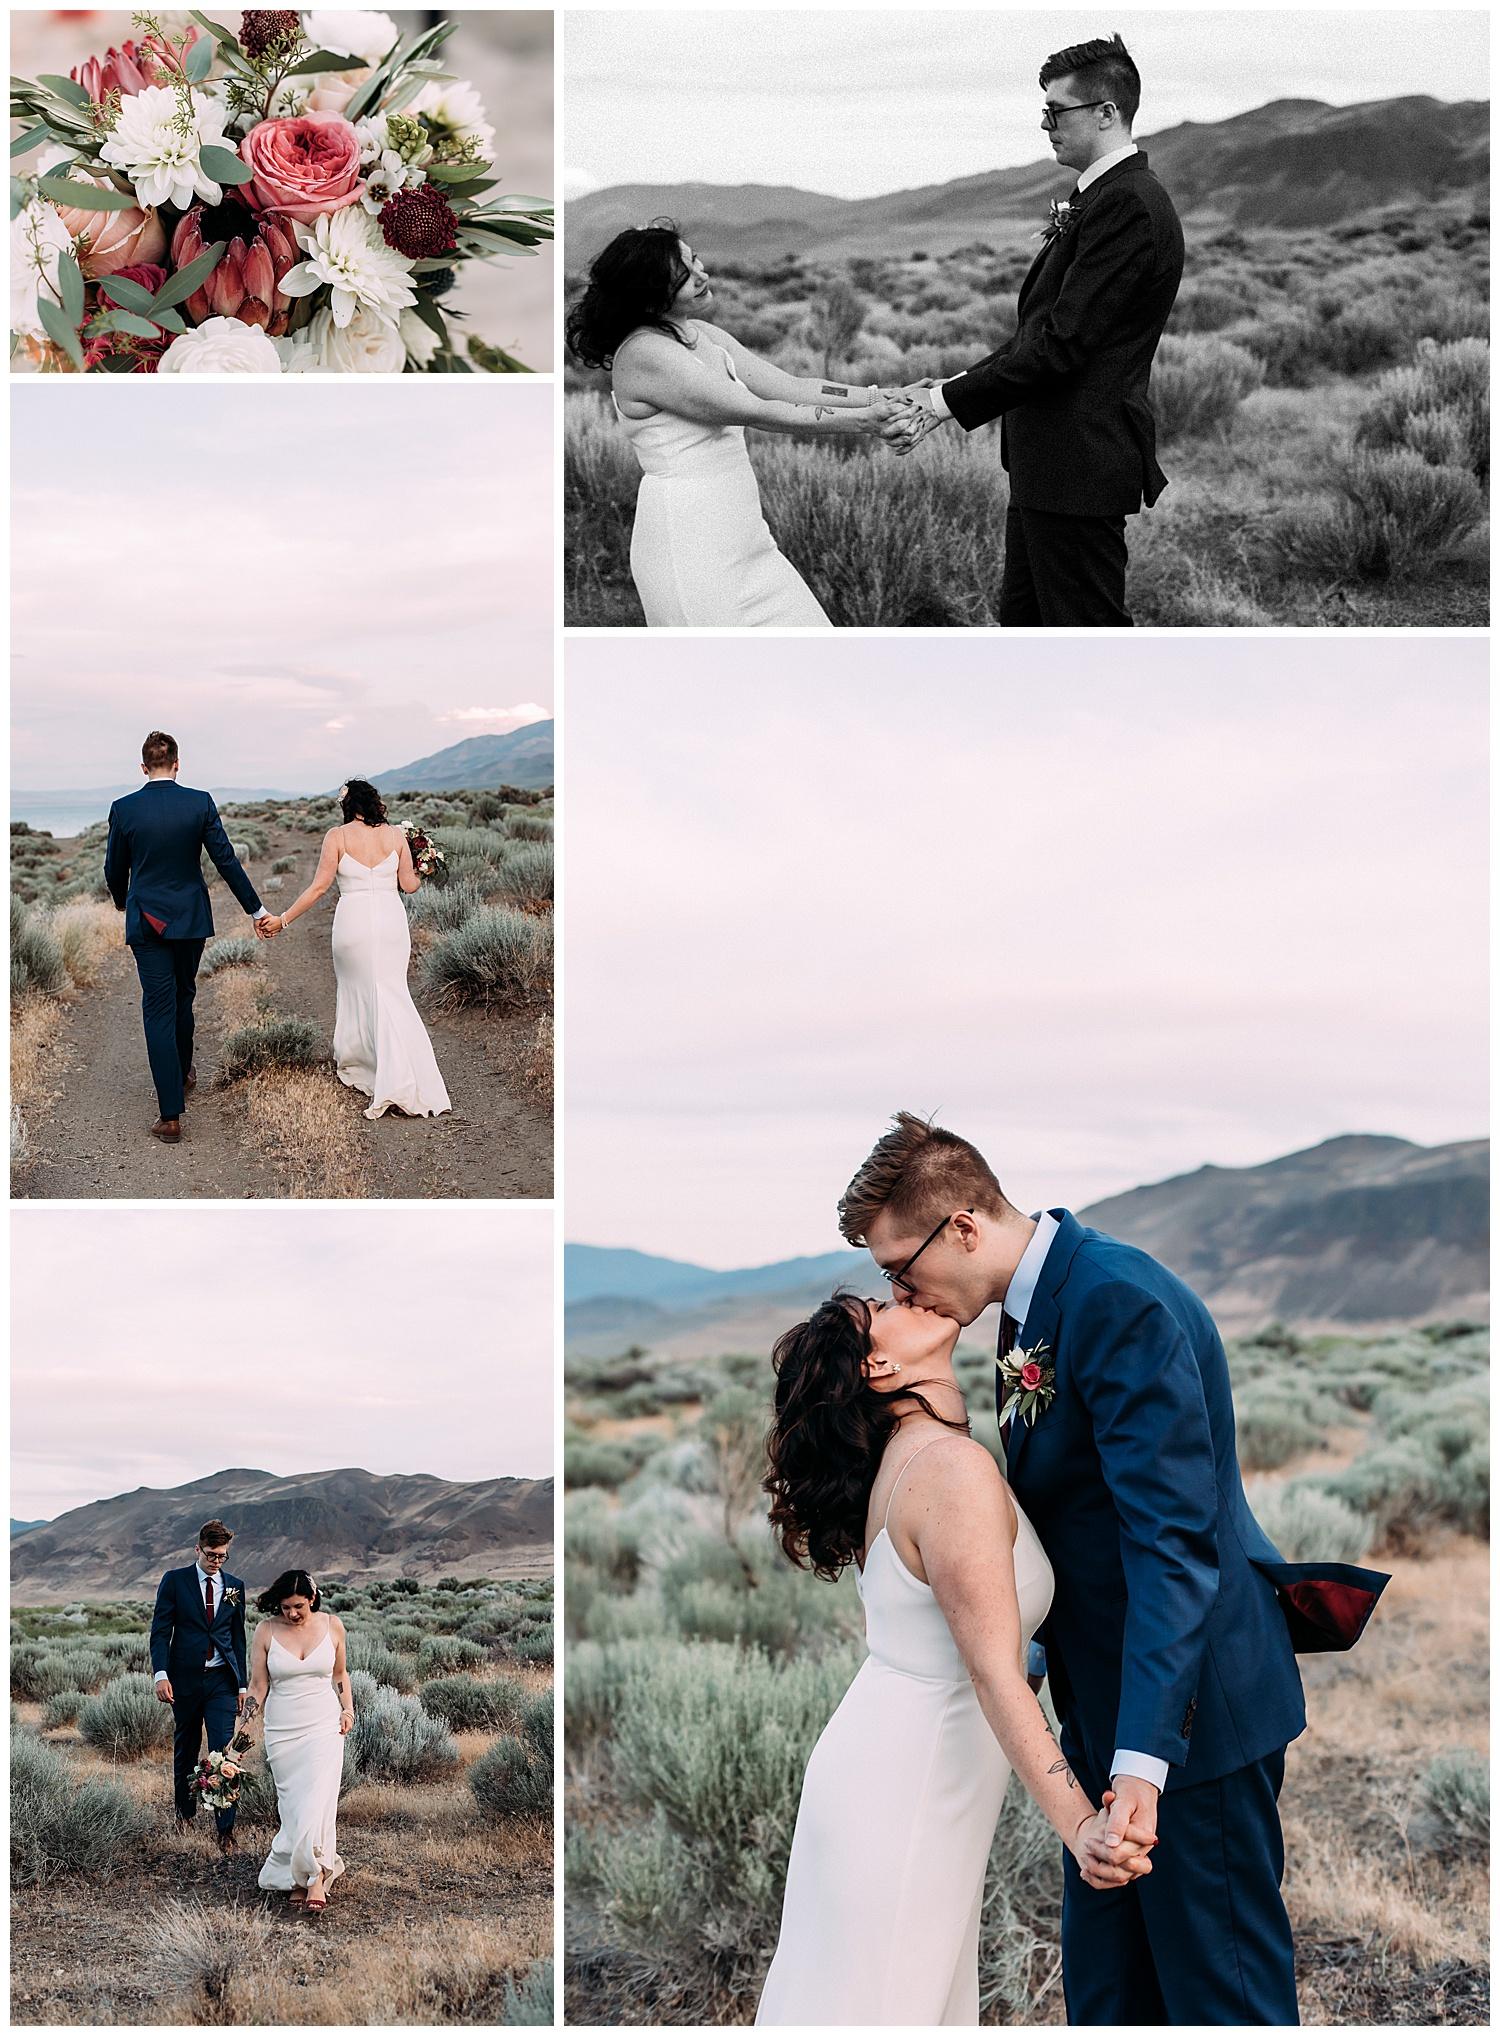 Ellen + Will | Reno Elopement Photographer | Pyramid Lake, NV_0004.jpg